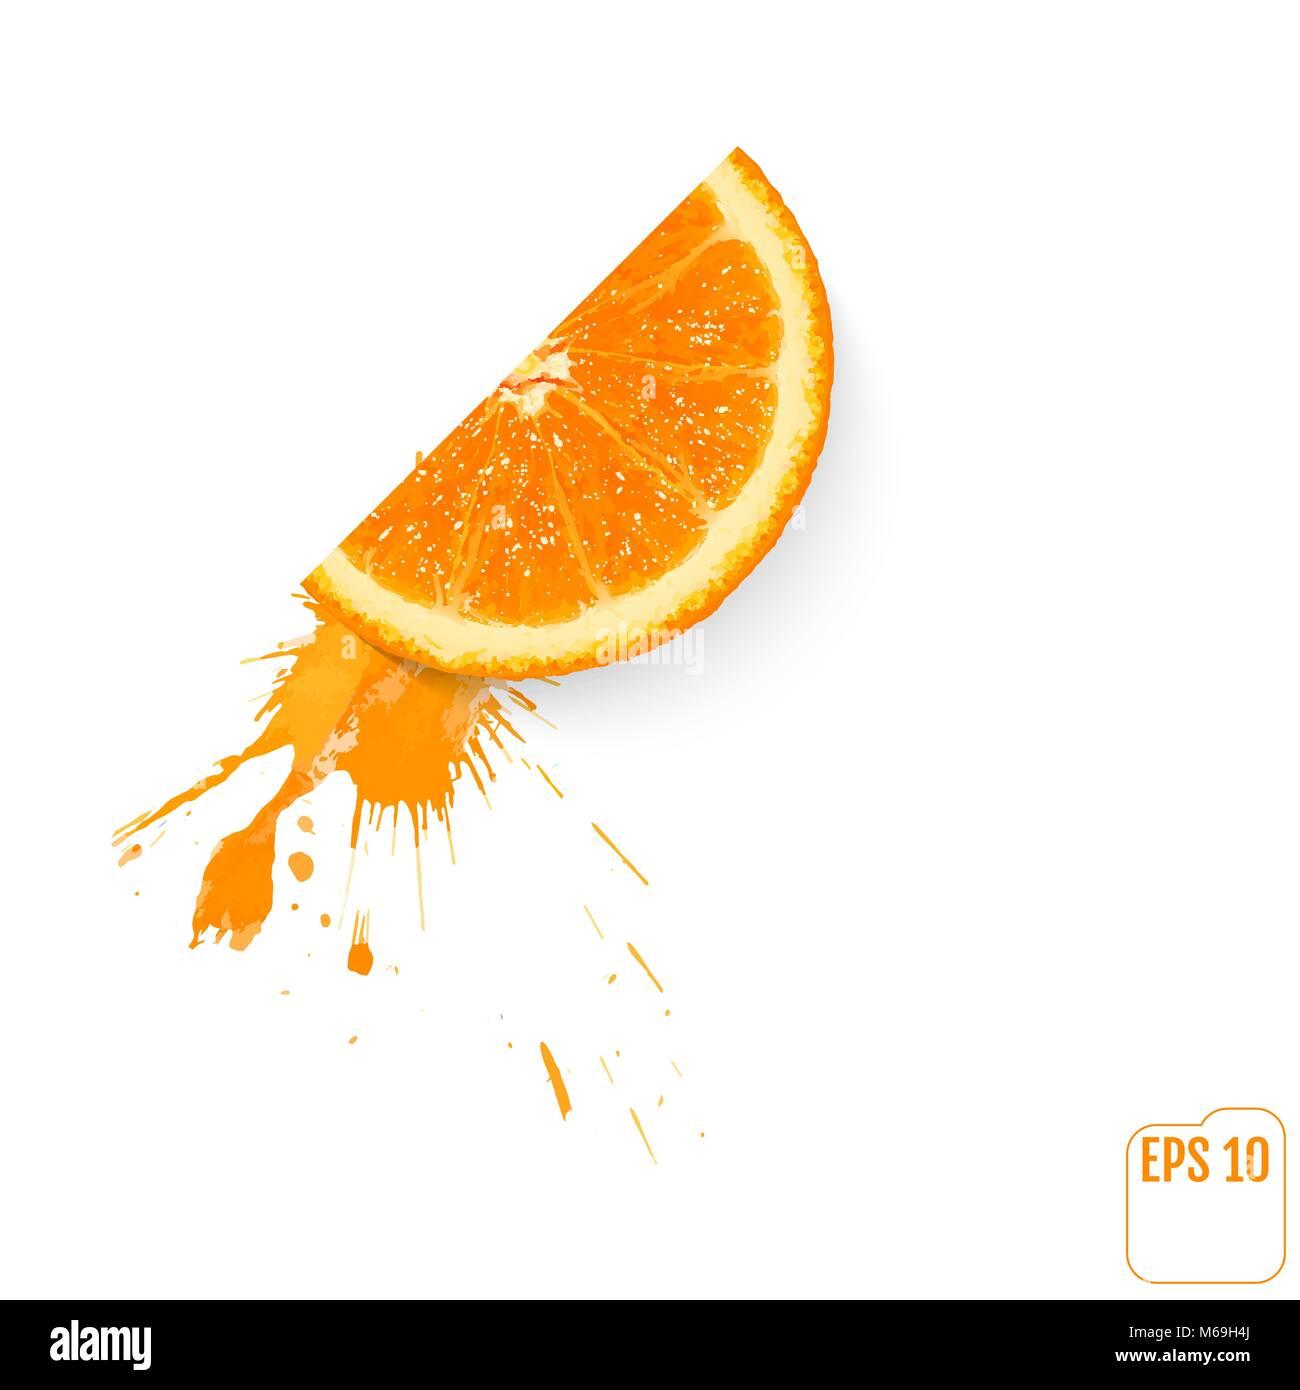 An orange slice with a spray of juice  Vector Stock Vector